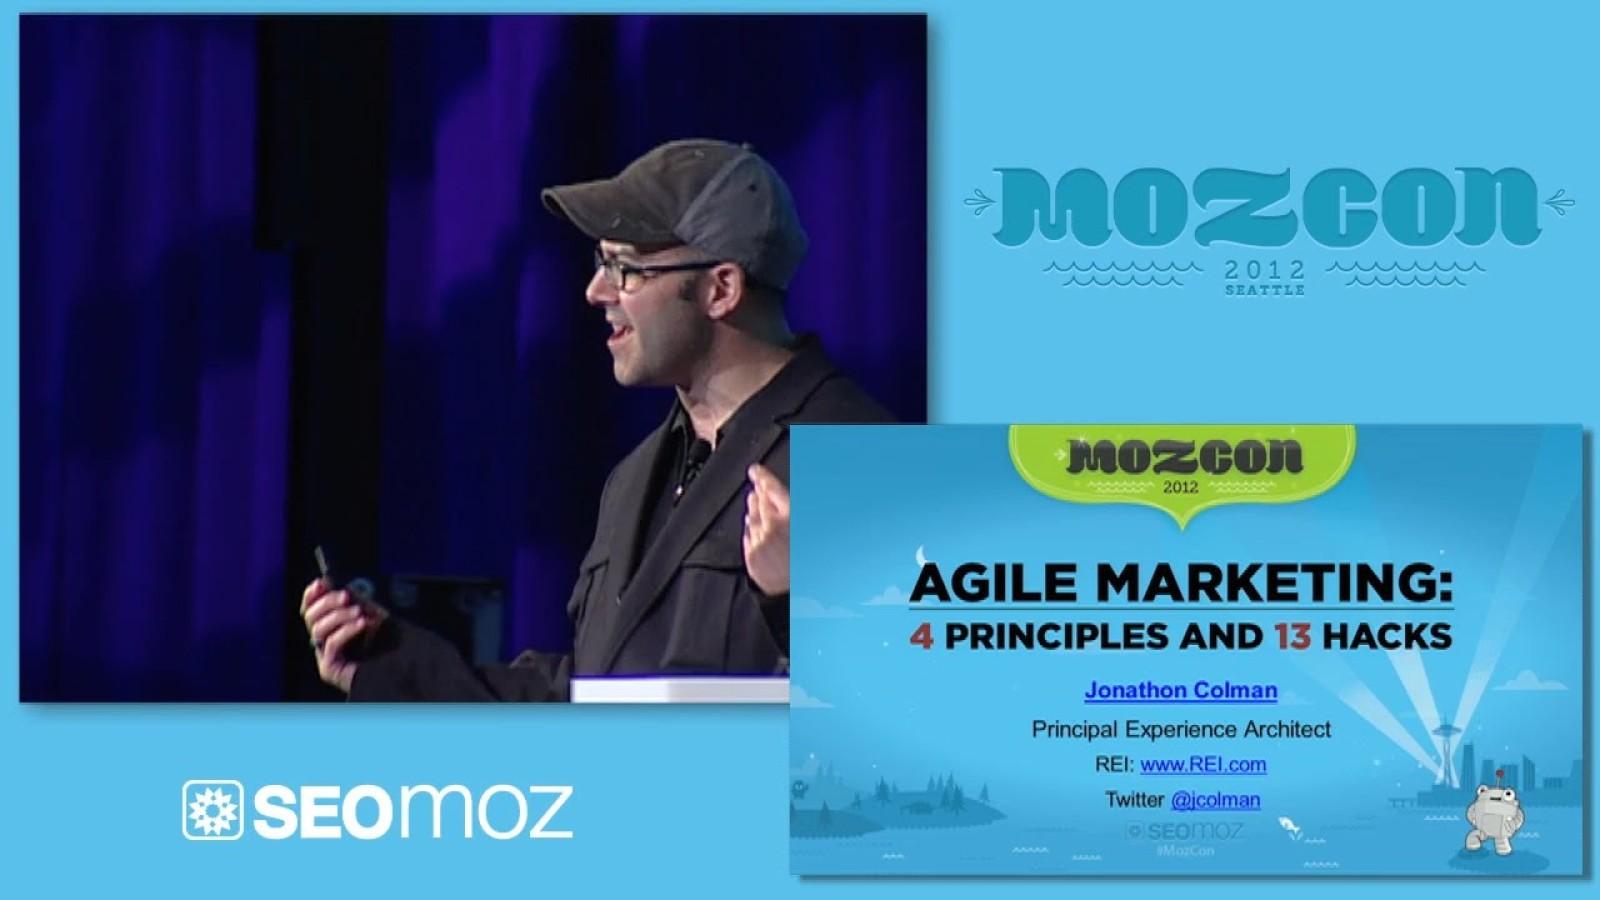 Agile Marketing: 4 Principles and 13 Hacks